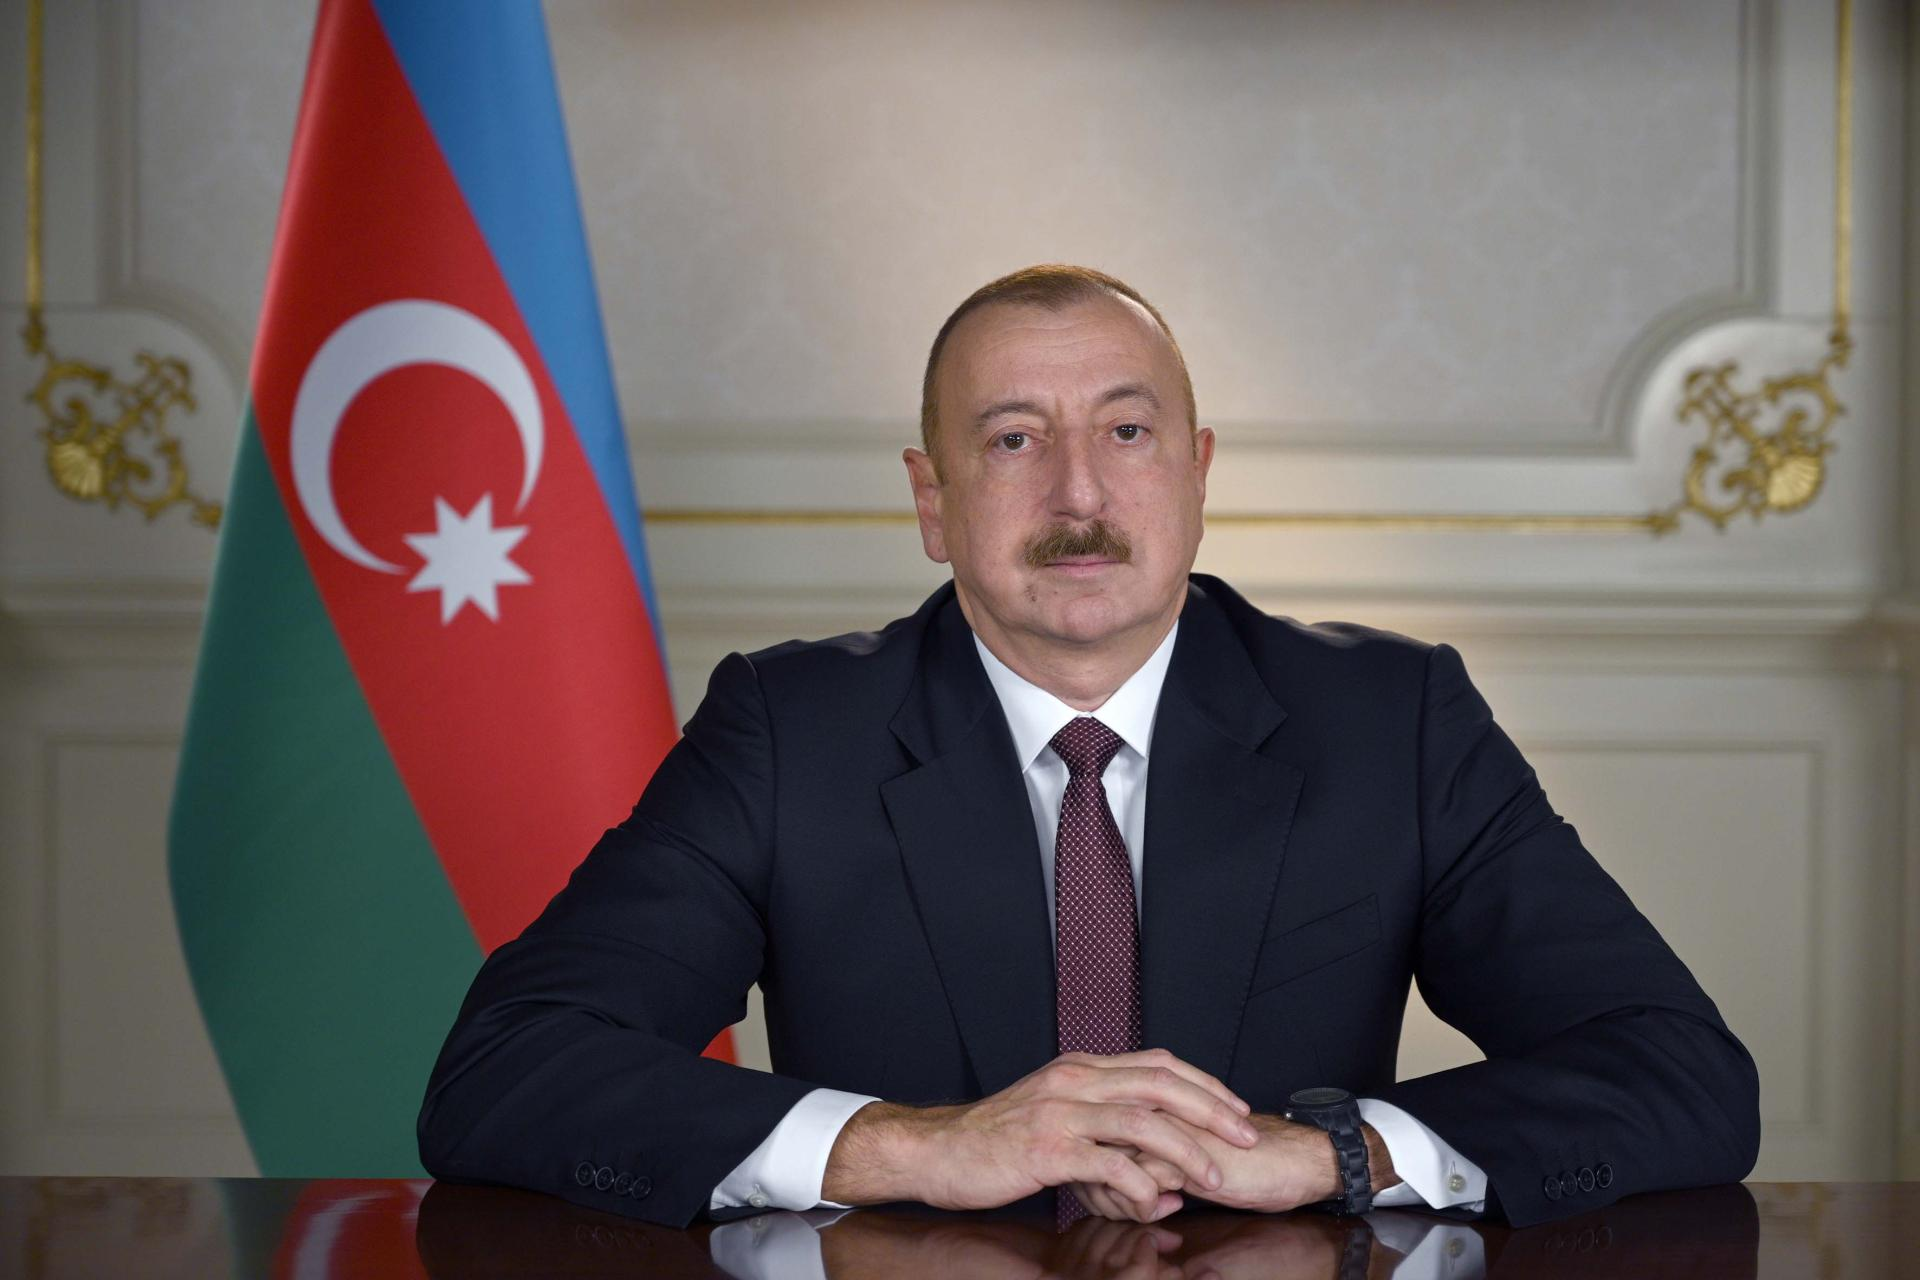 2020/06/ilham_aliyev_main_new_president_310120_1_1591084345.jpg